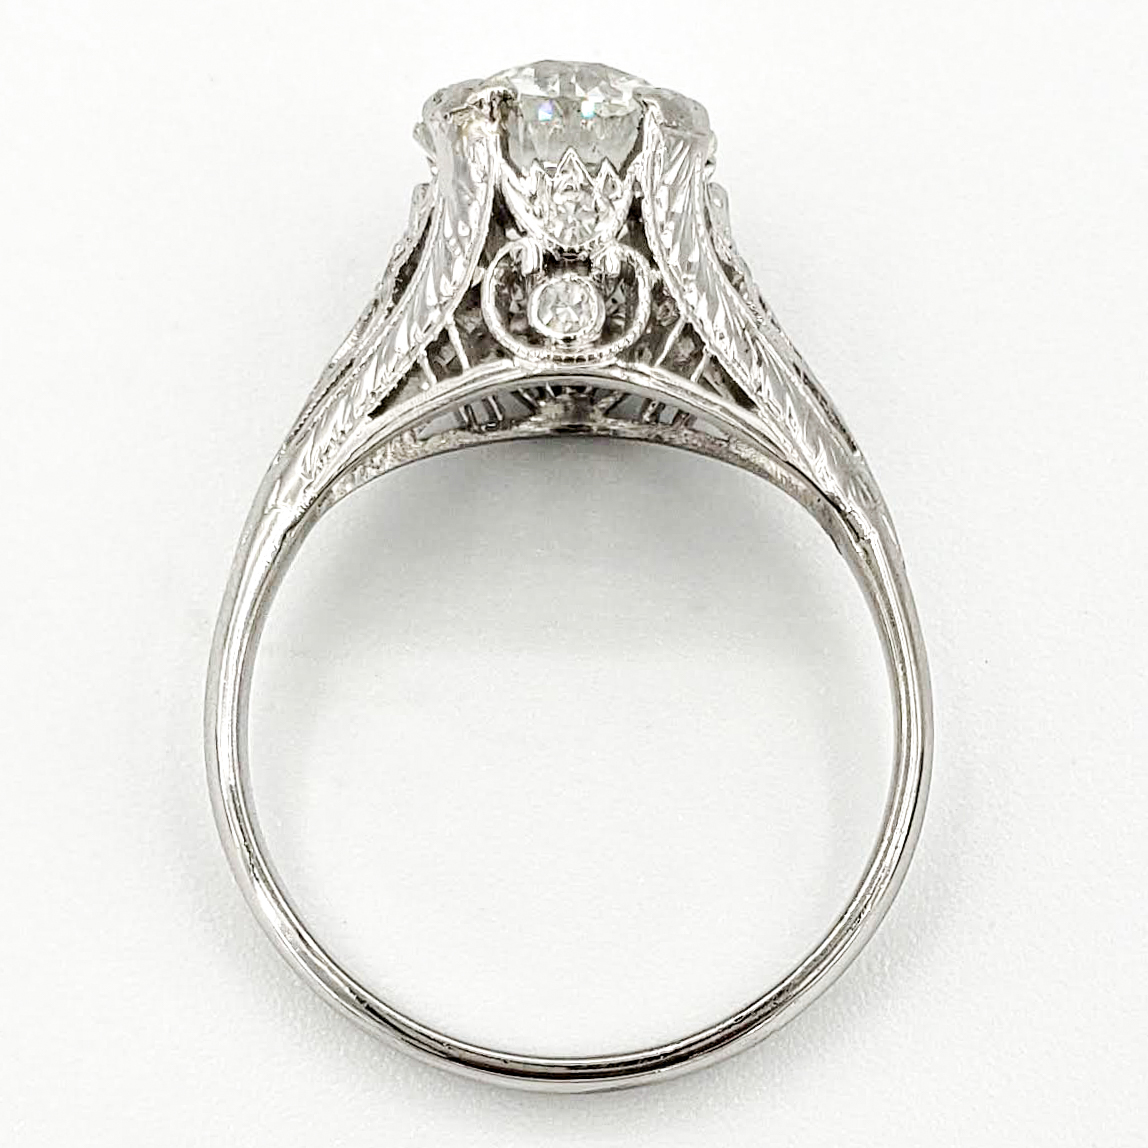 vintage-platinum-engagement-ring-with-1-94-carat-old-european-cut-diamond-egl-h-vs2